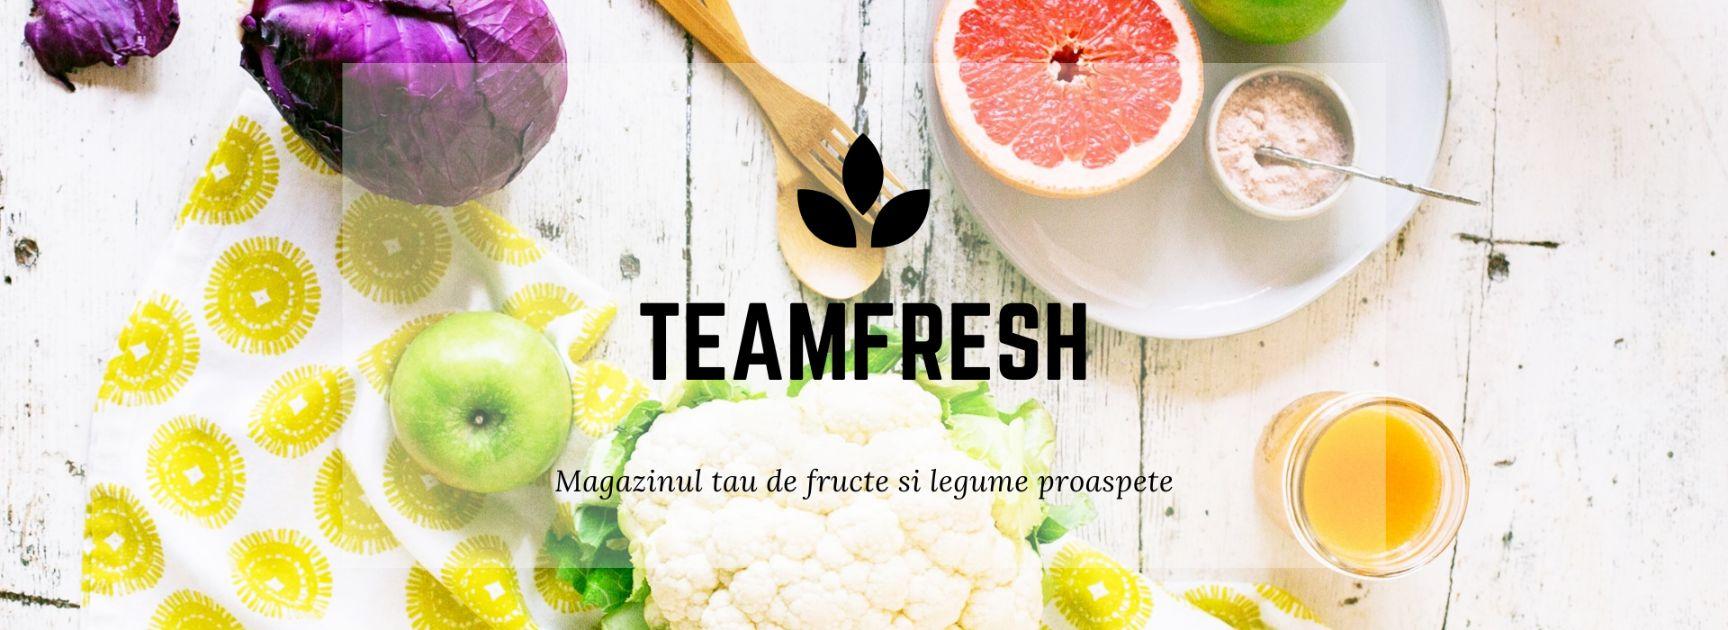 teamfresh6